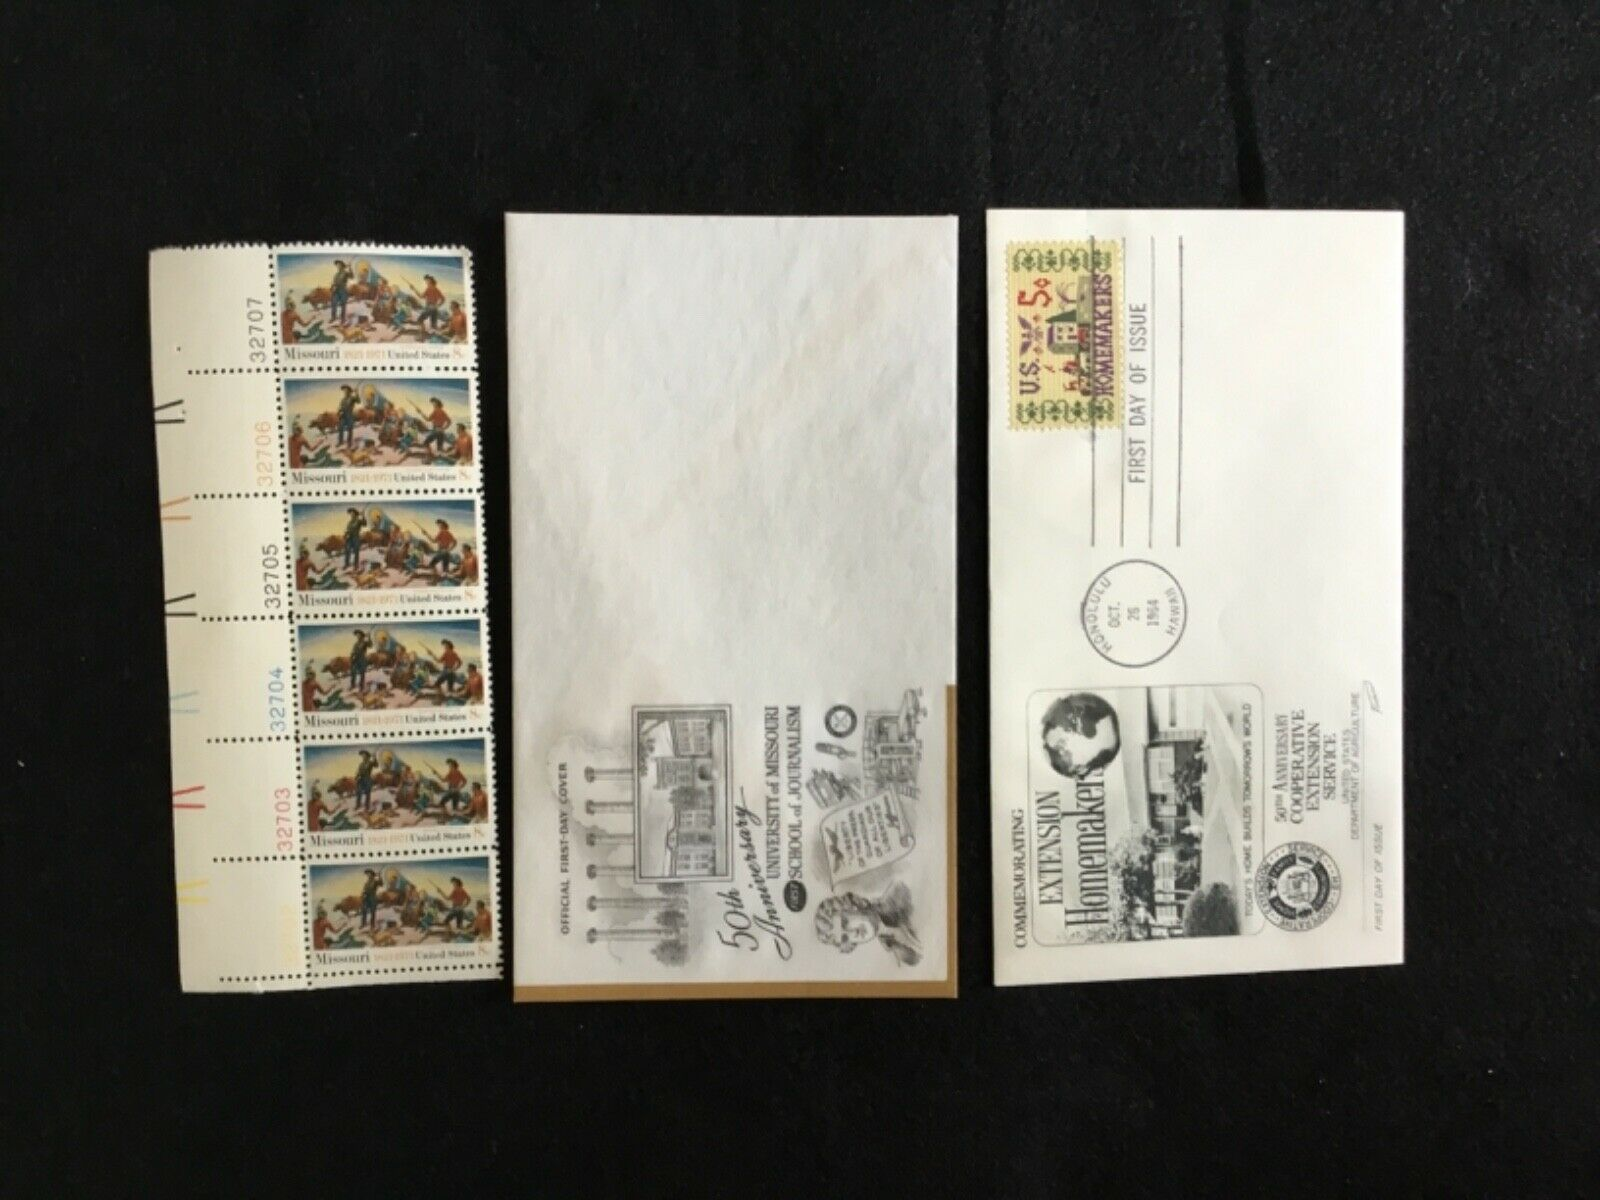 8 Cent Missouri, M U School Of Journalism, Coop Ext Service Envelope - $2.50